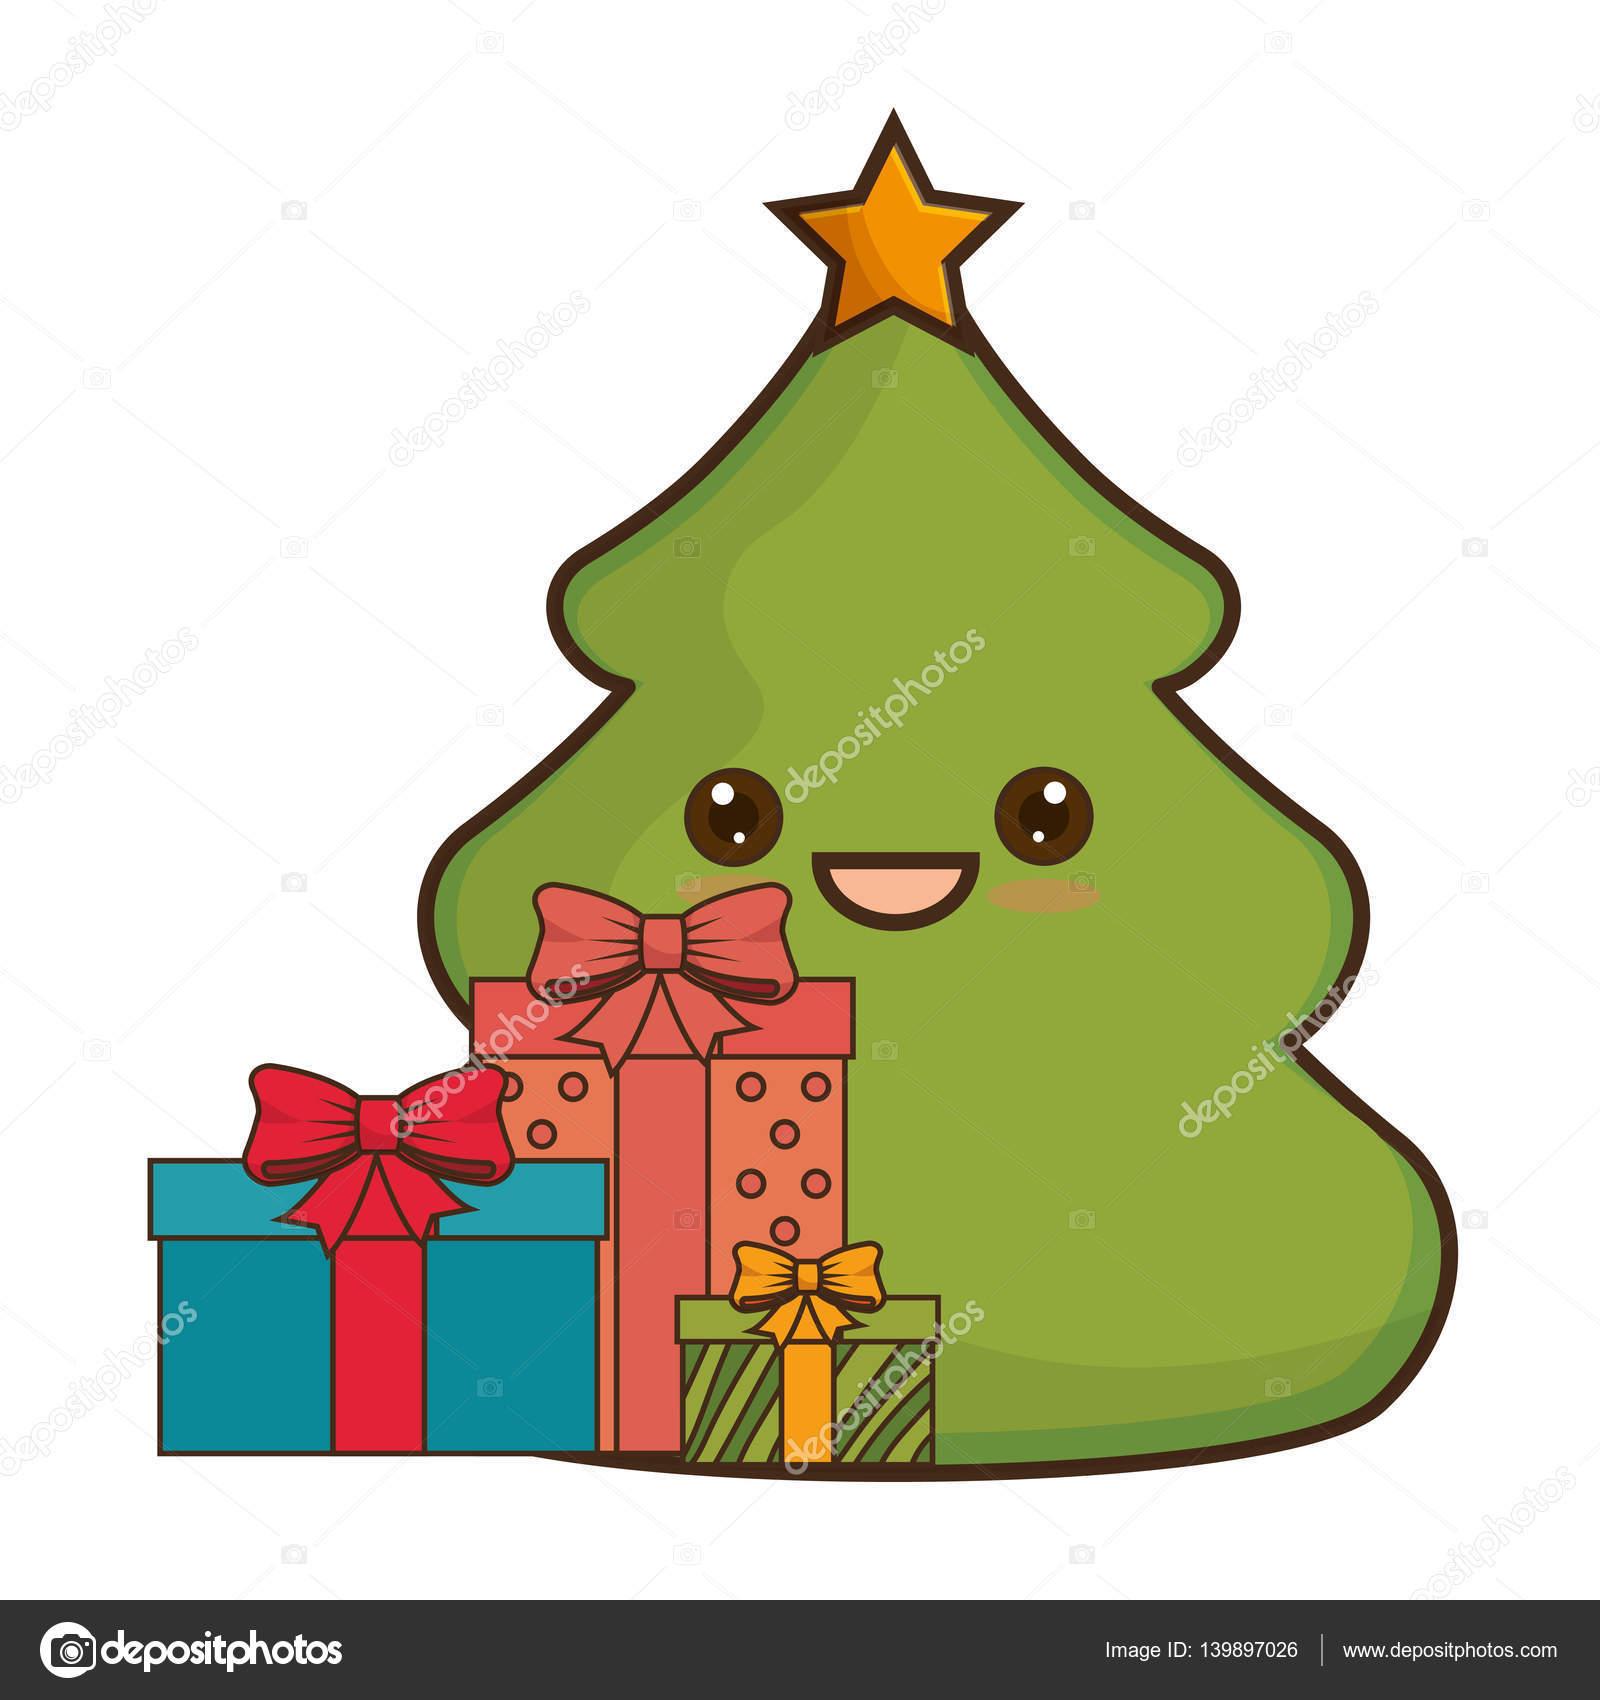 Immagini Natalizie Kawaii.Albero Di Natale Allegro Stile Kawaii Vettoriali Stock C Yupiramos